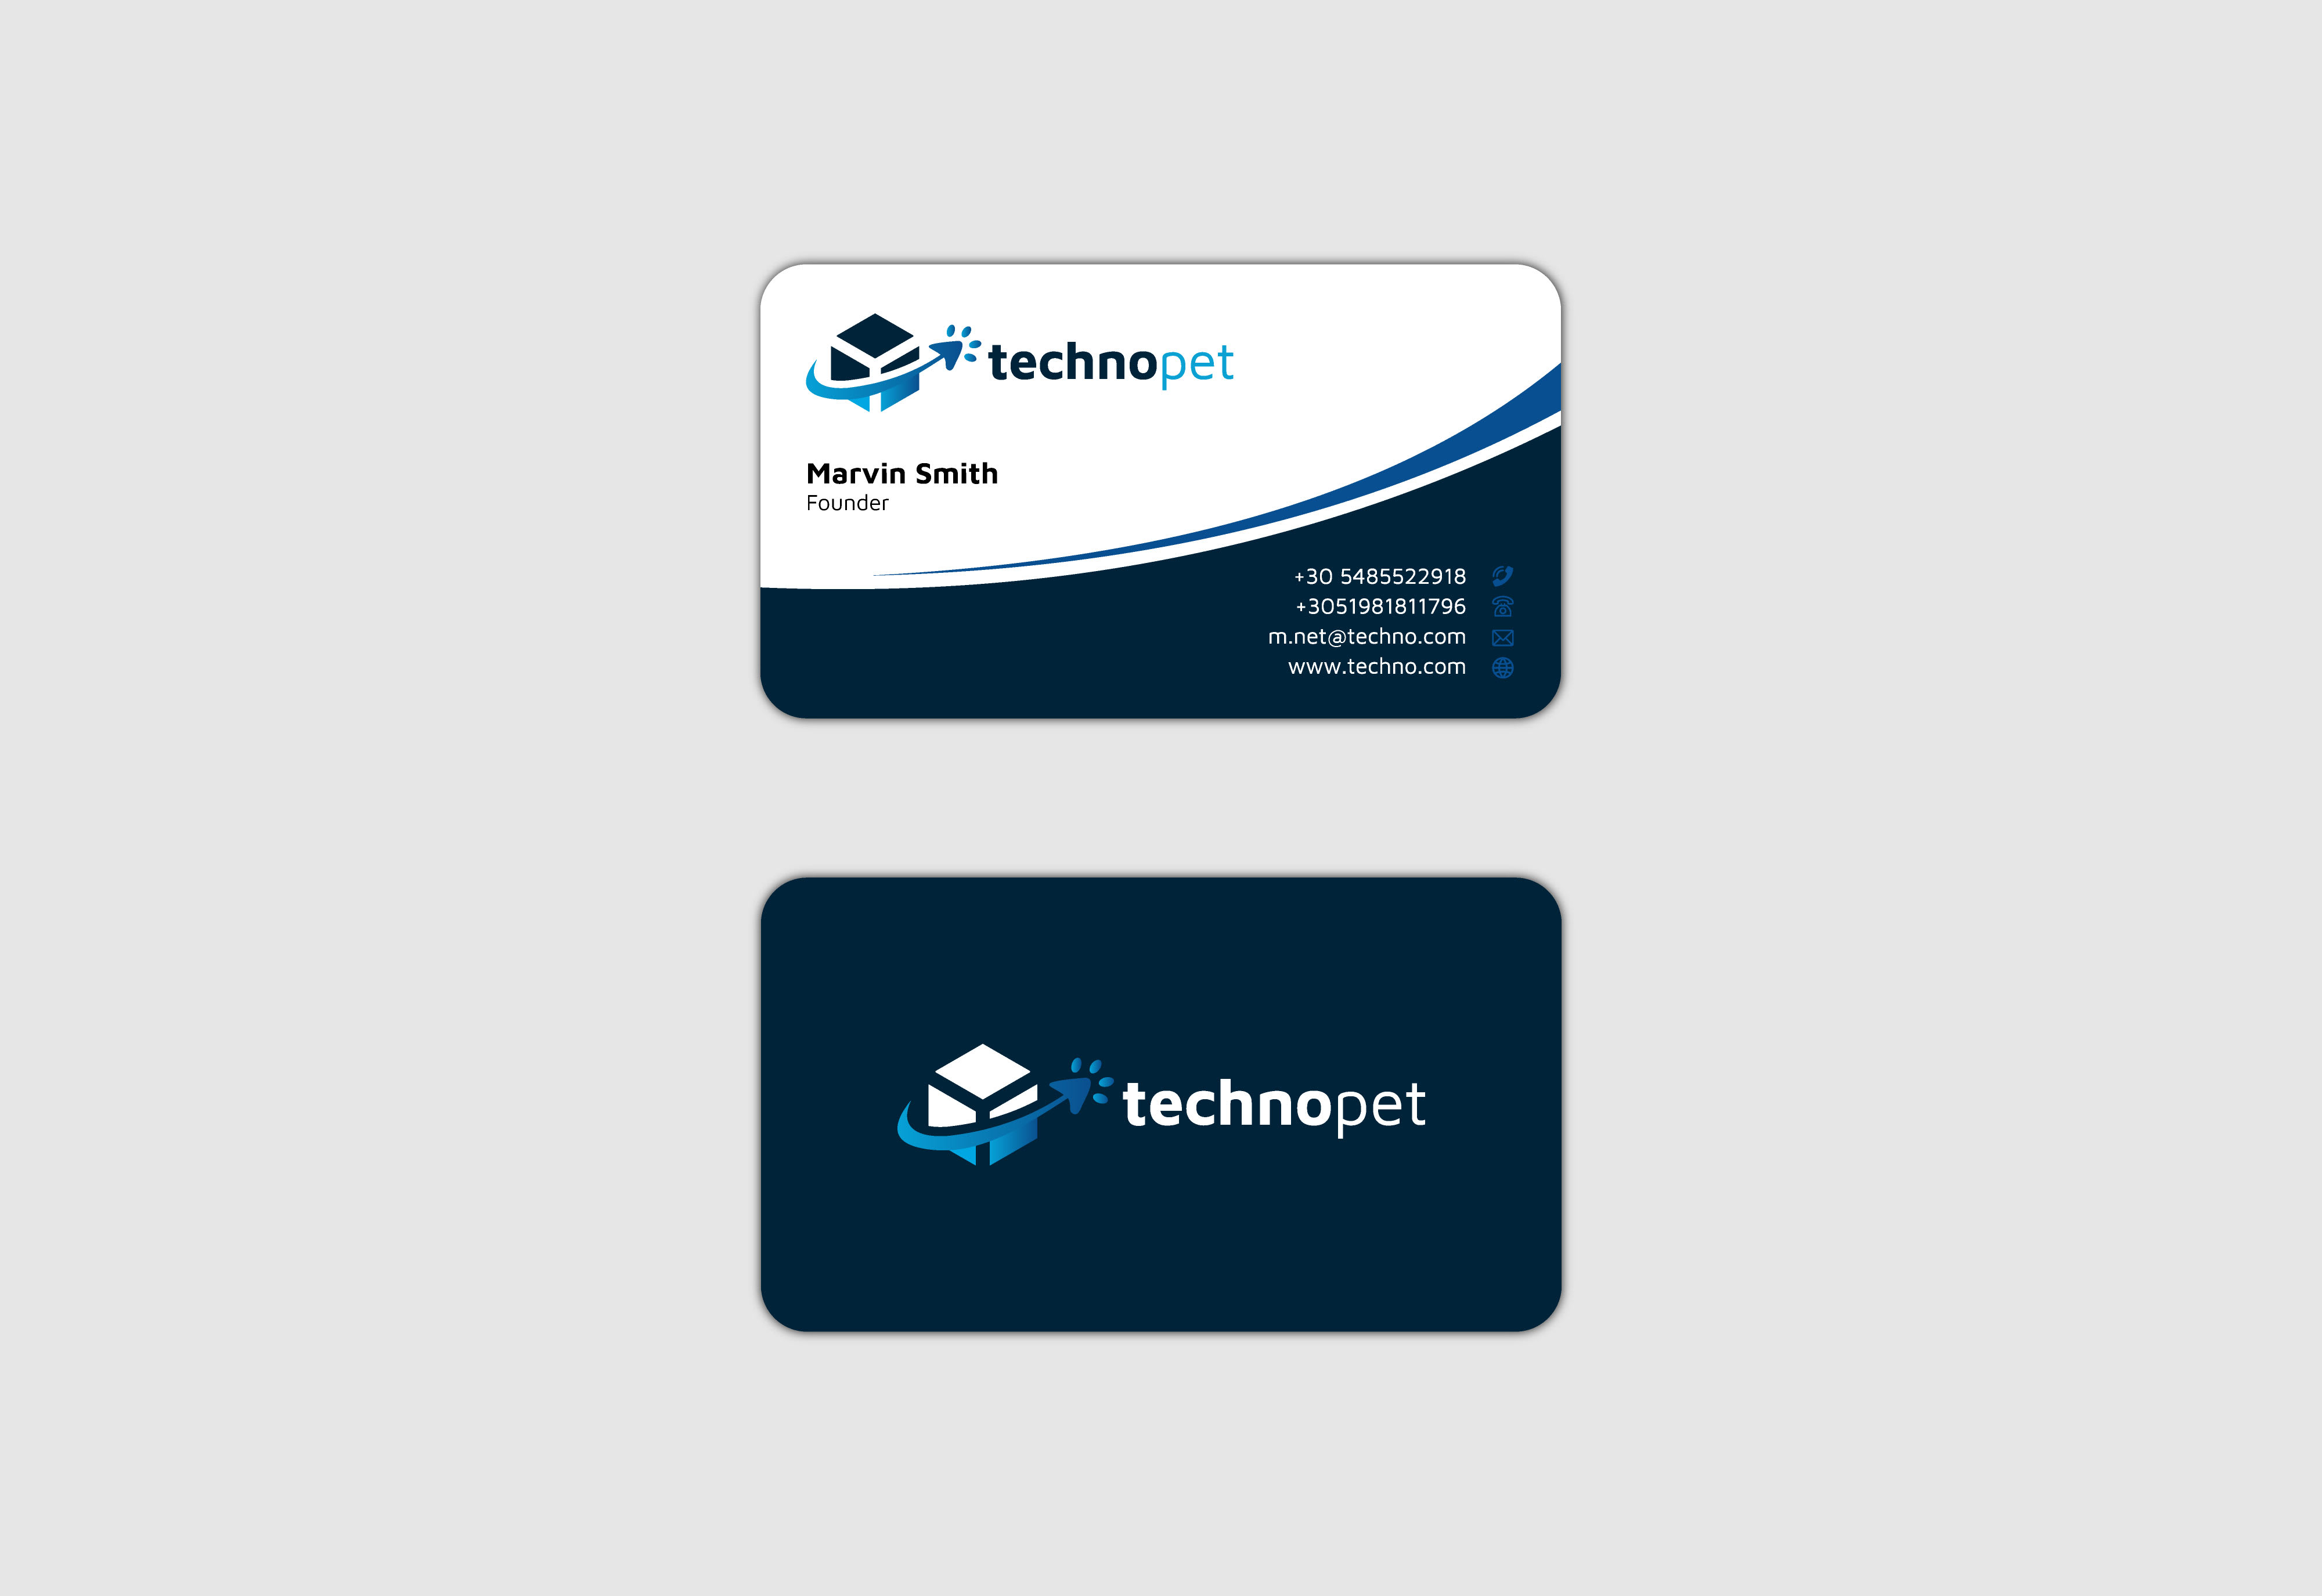 I will do luxury business card design and minimalist logo design